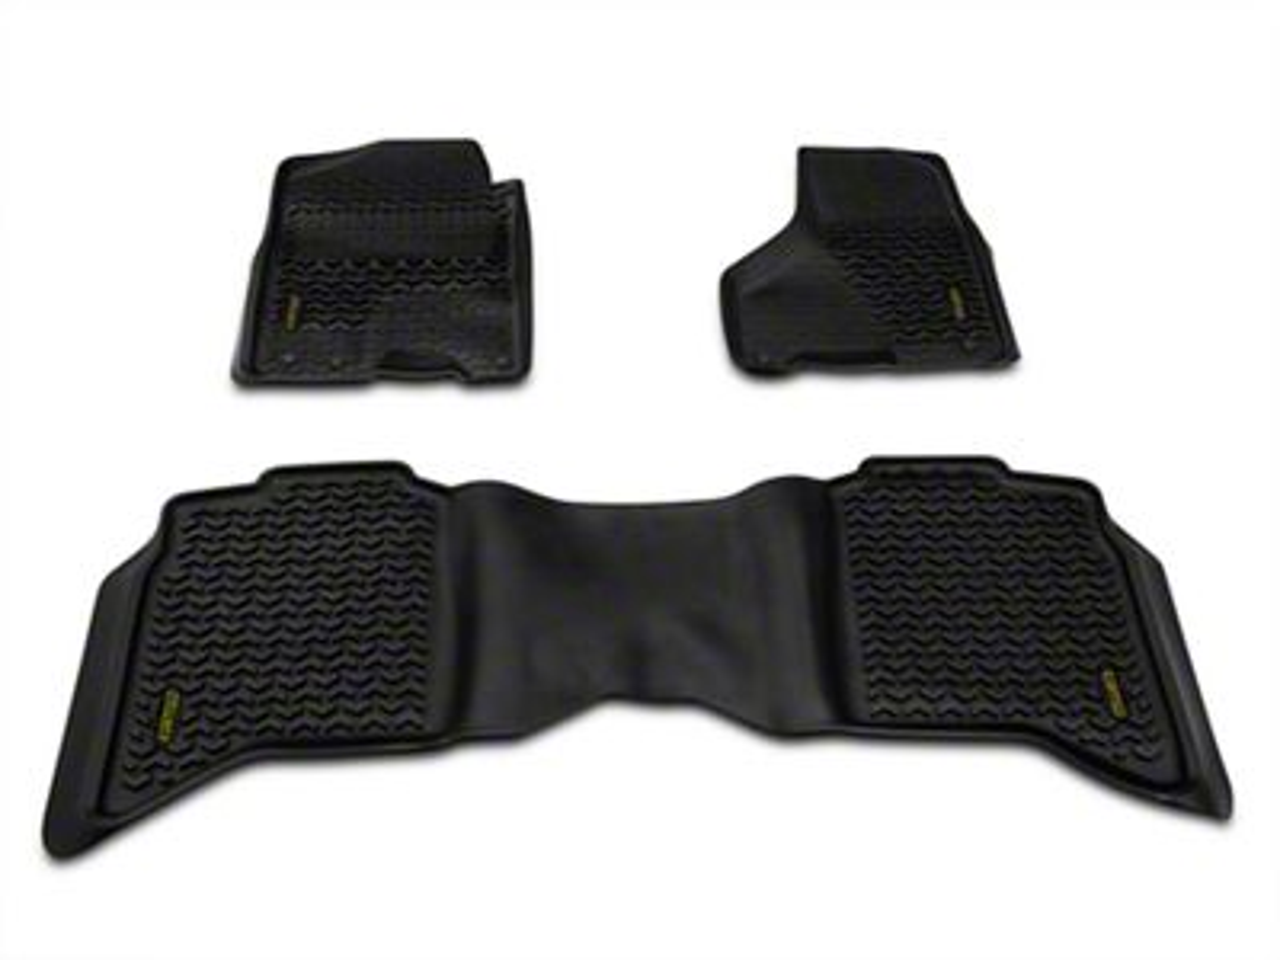 Barricade Front & Rear Floor Liners - Black (09-18 RAM 1500 Crew Cab)